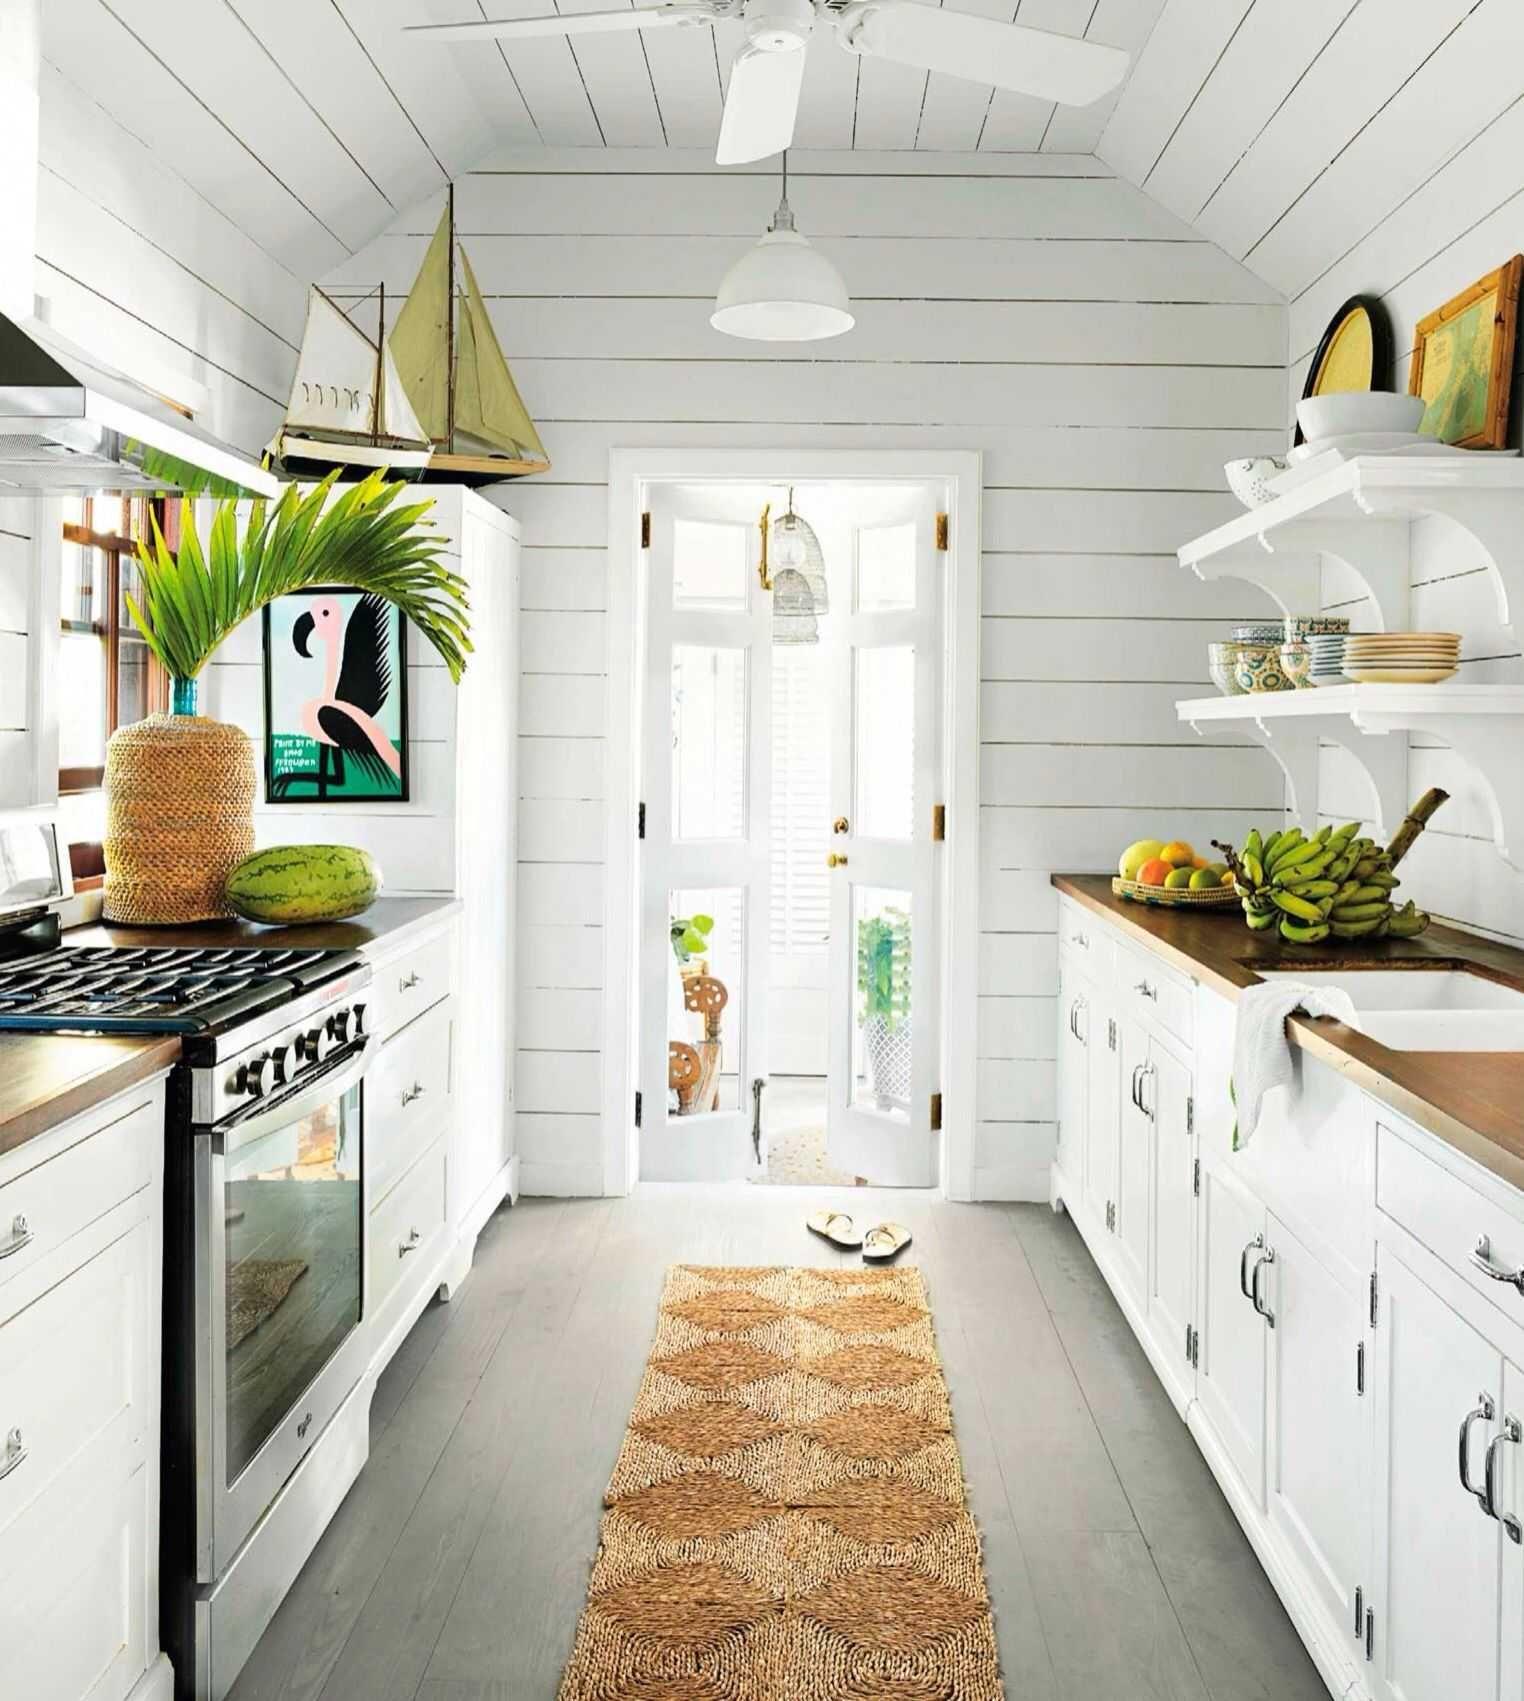 Scandinavian farmhouse kitchen inspirational white sink decor idea house decorating inspiration also home ideas rh pinterest